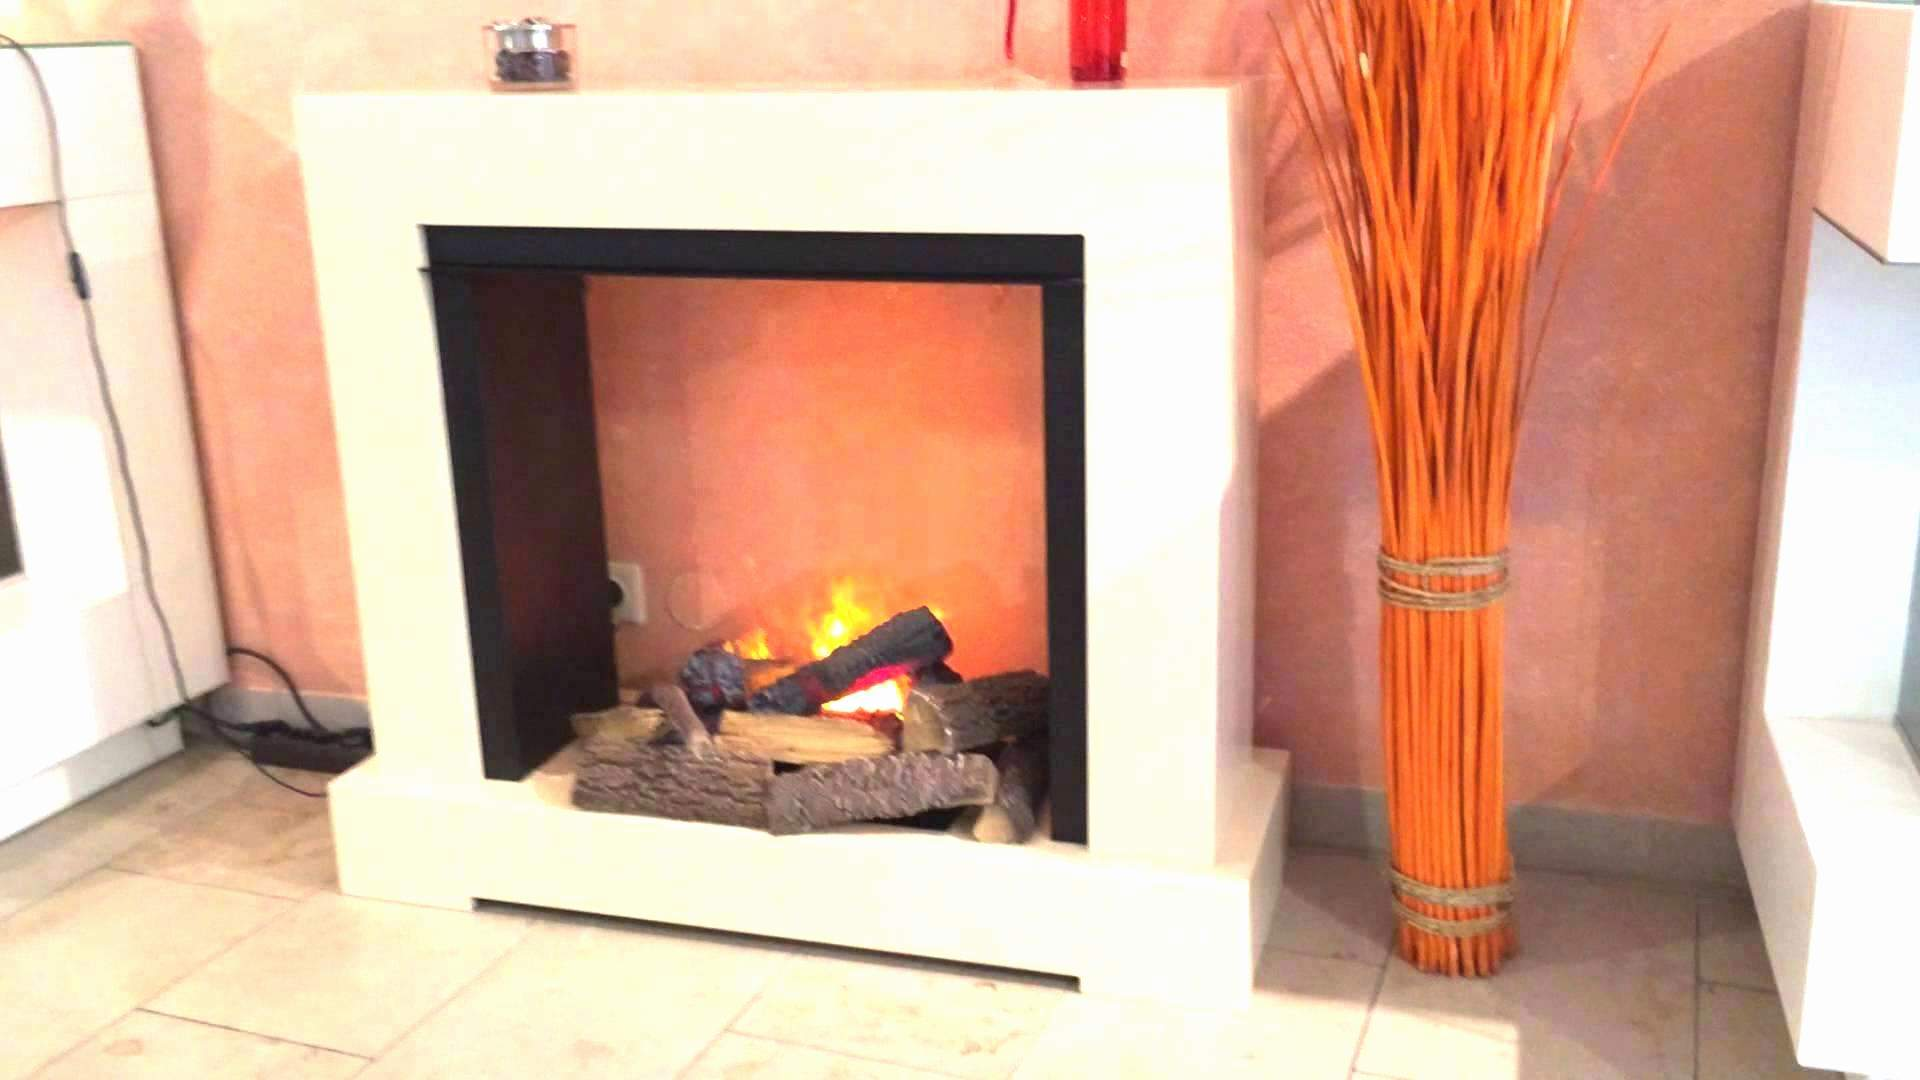 dekokamin selber bauen luxus kaminofen garten inspirierend grill im garten grill kamin 0d of dekokamin selber bauen